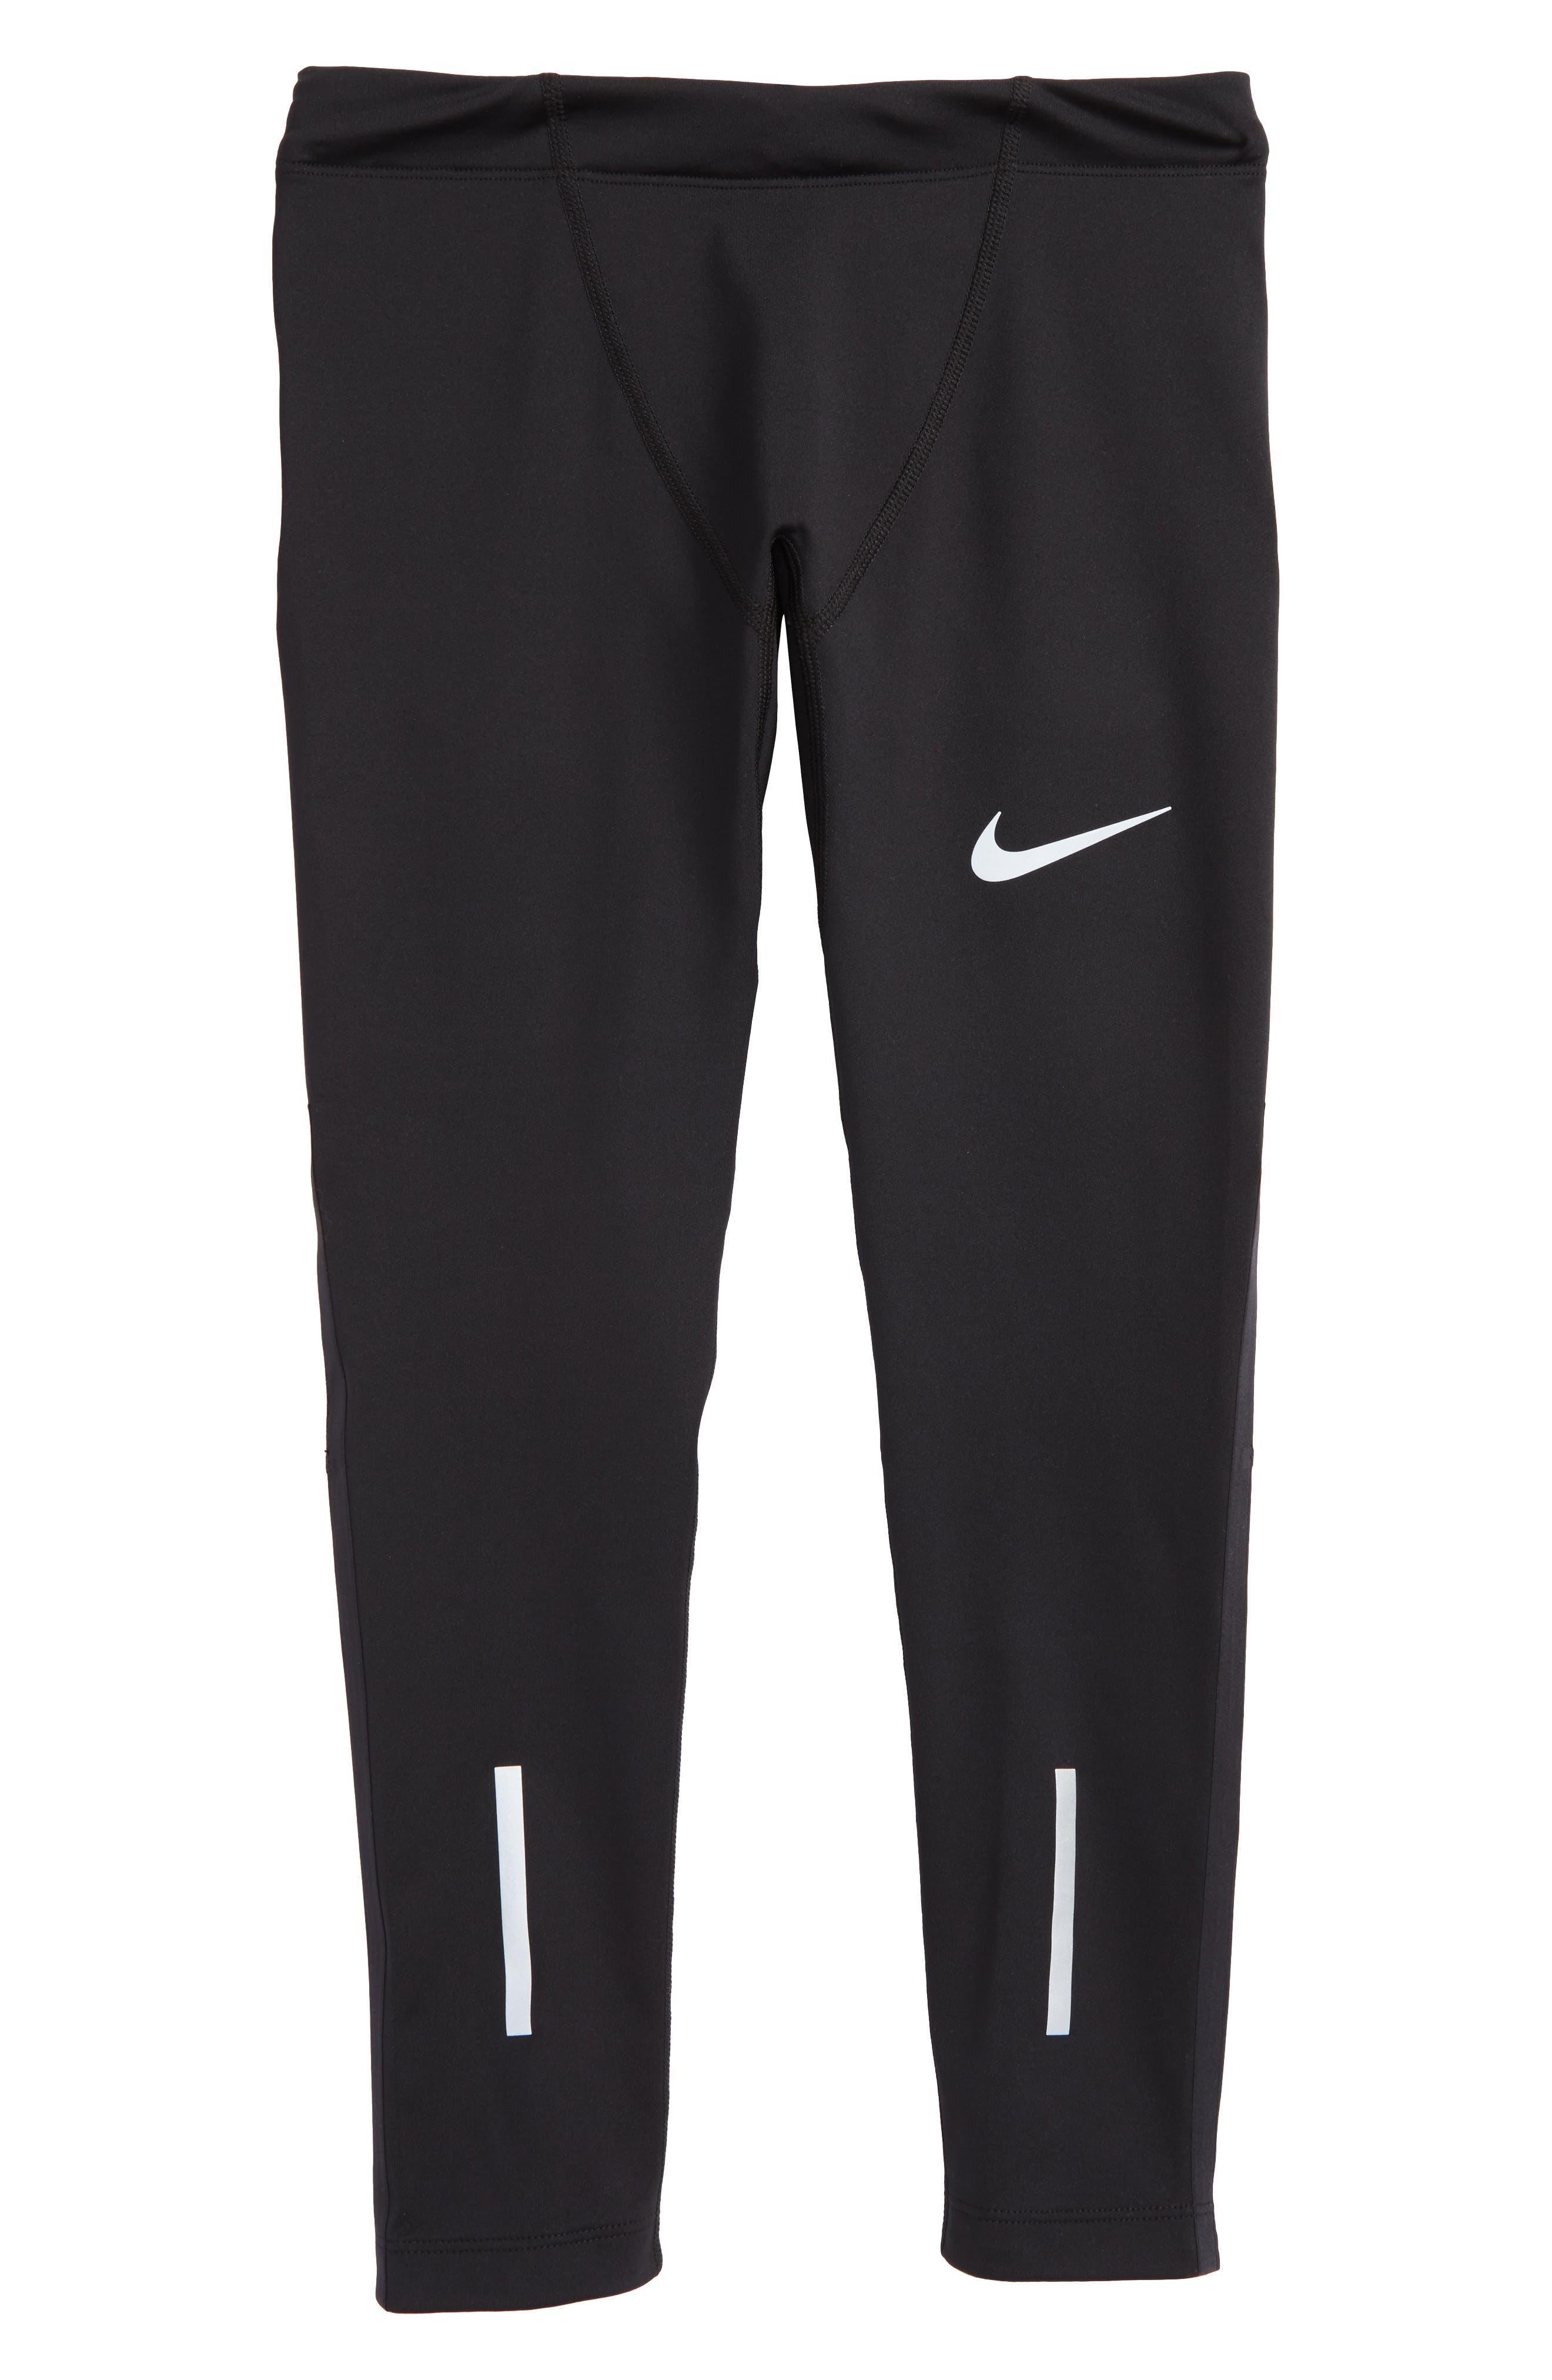 Nike Power Dry Running Tights (Little Boys & Big Boys)